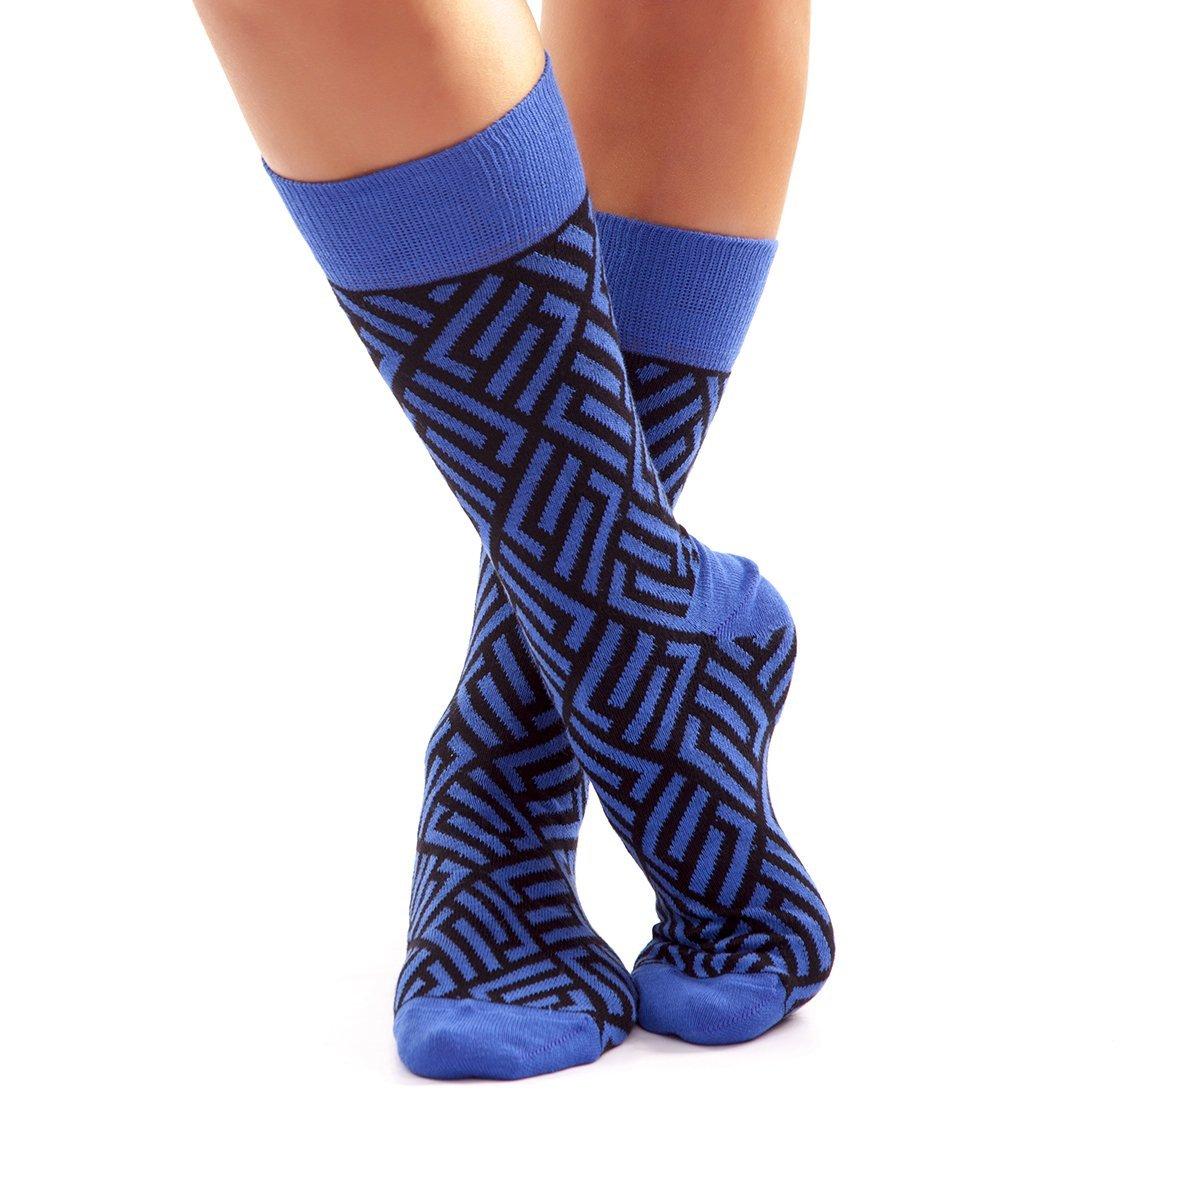 Calcetines Rombos Azules kalcetin.es